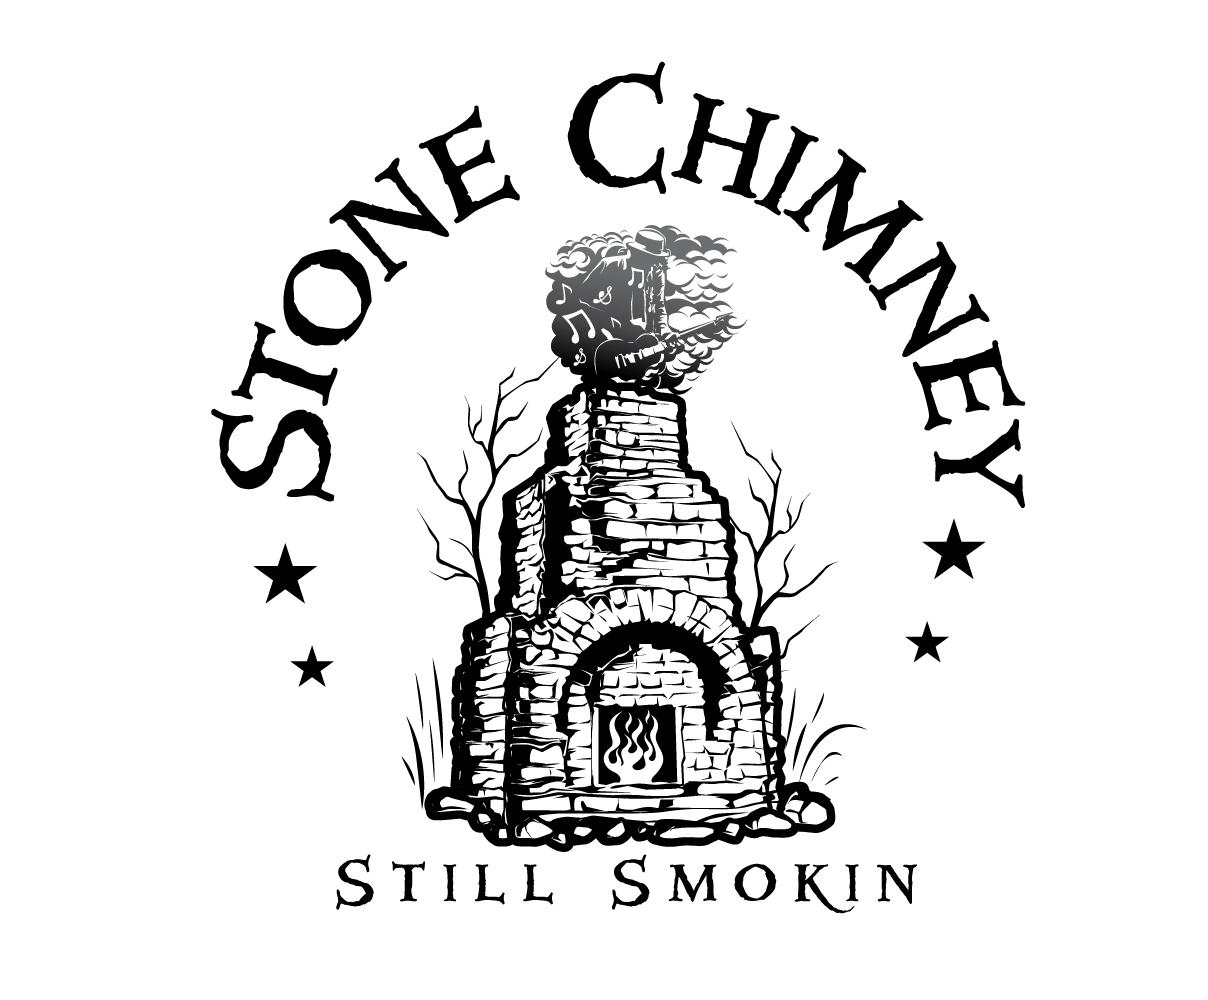 Logo Design by Graphicsexpert for Stone Chimneys | Design #18938042